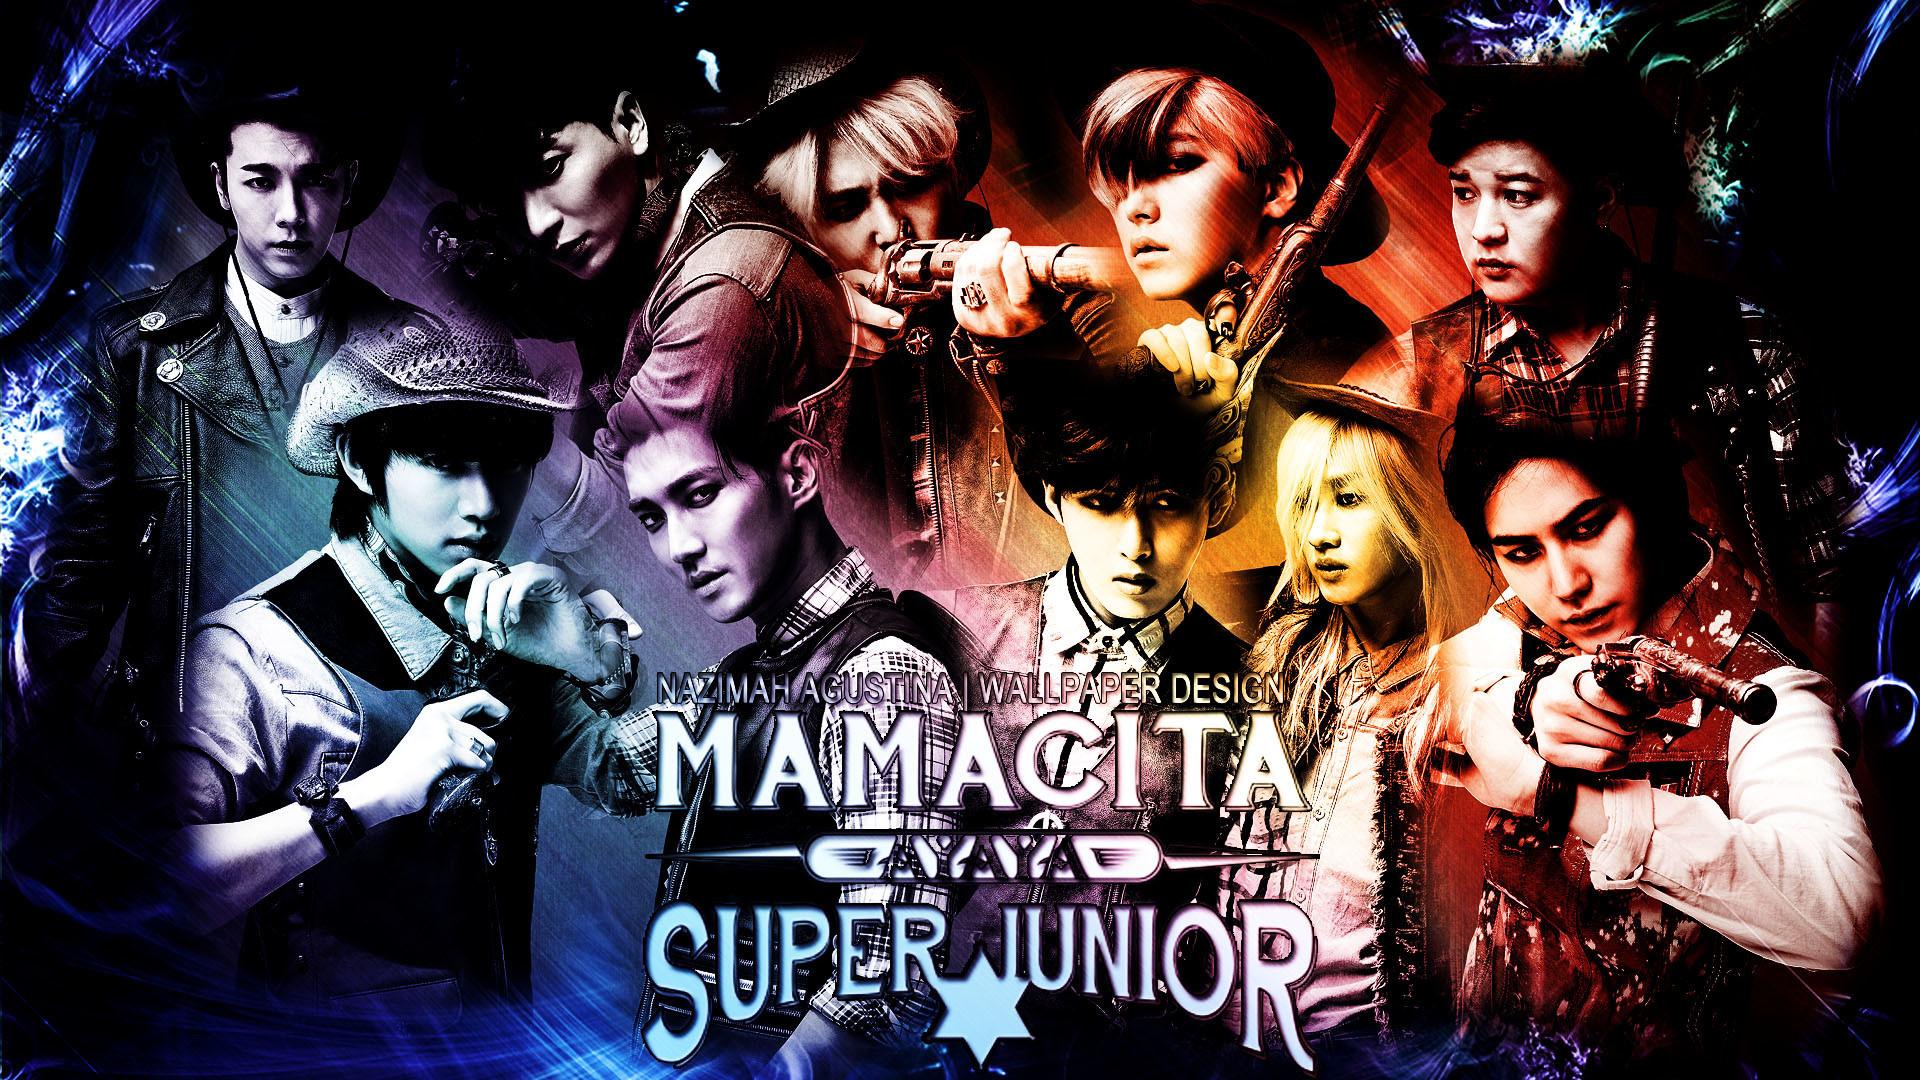 Super Junior Wallpapers QVJdr3